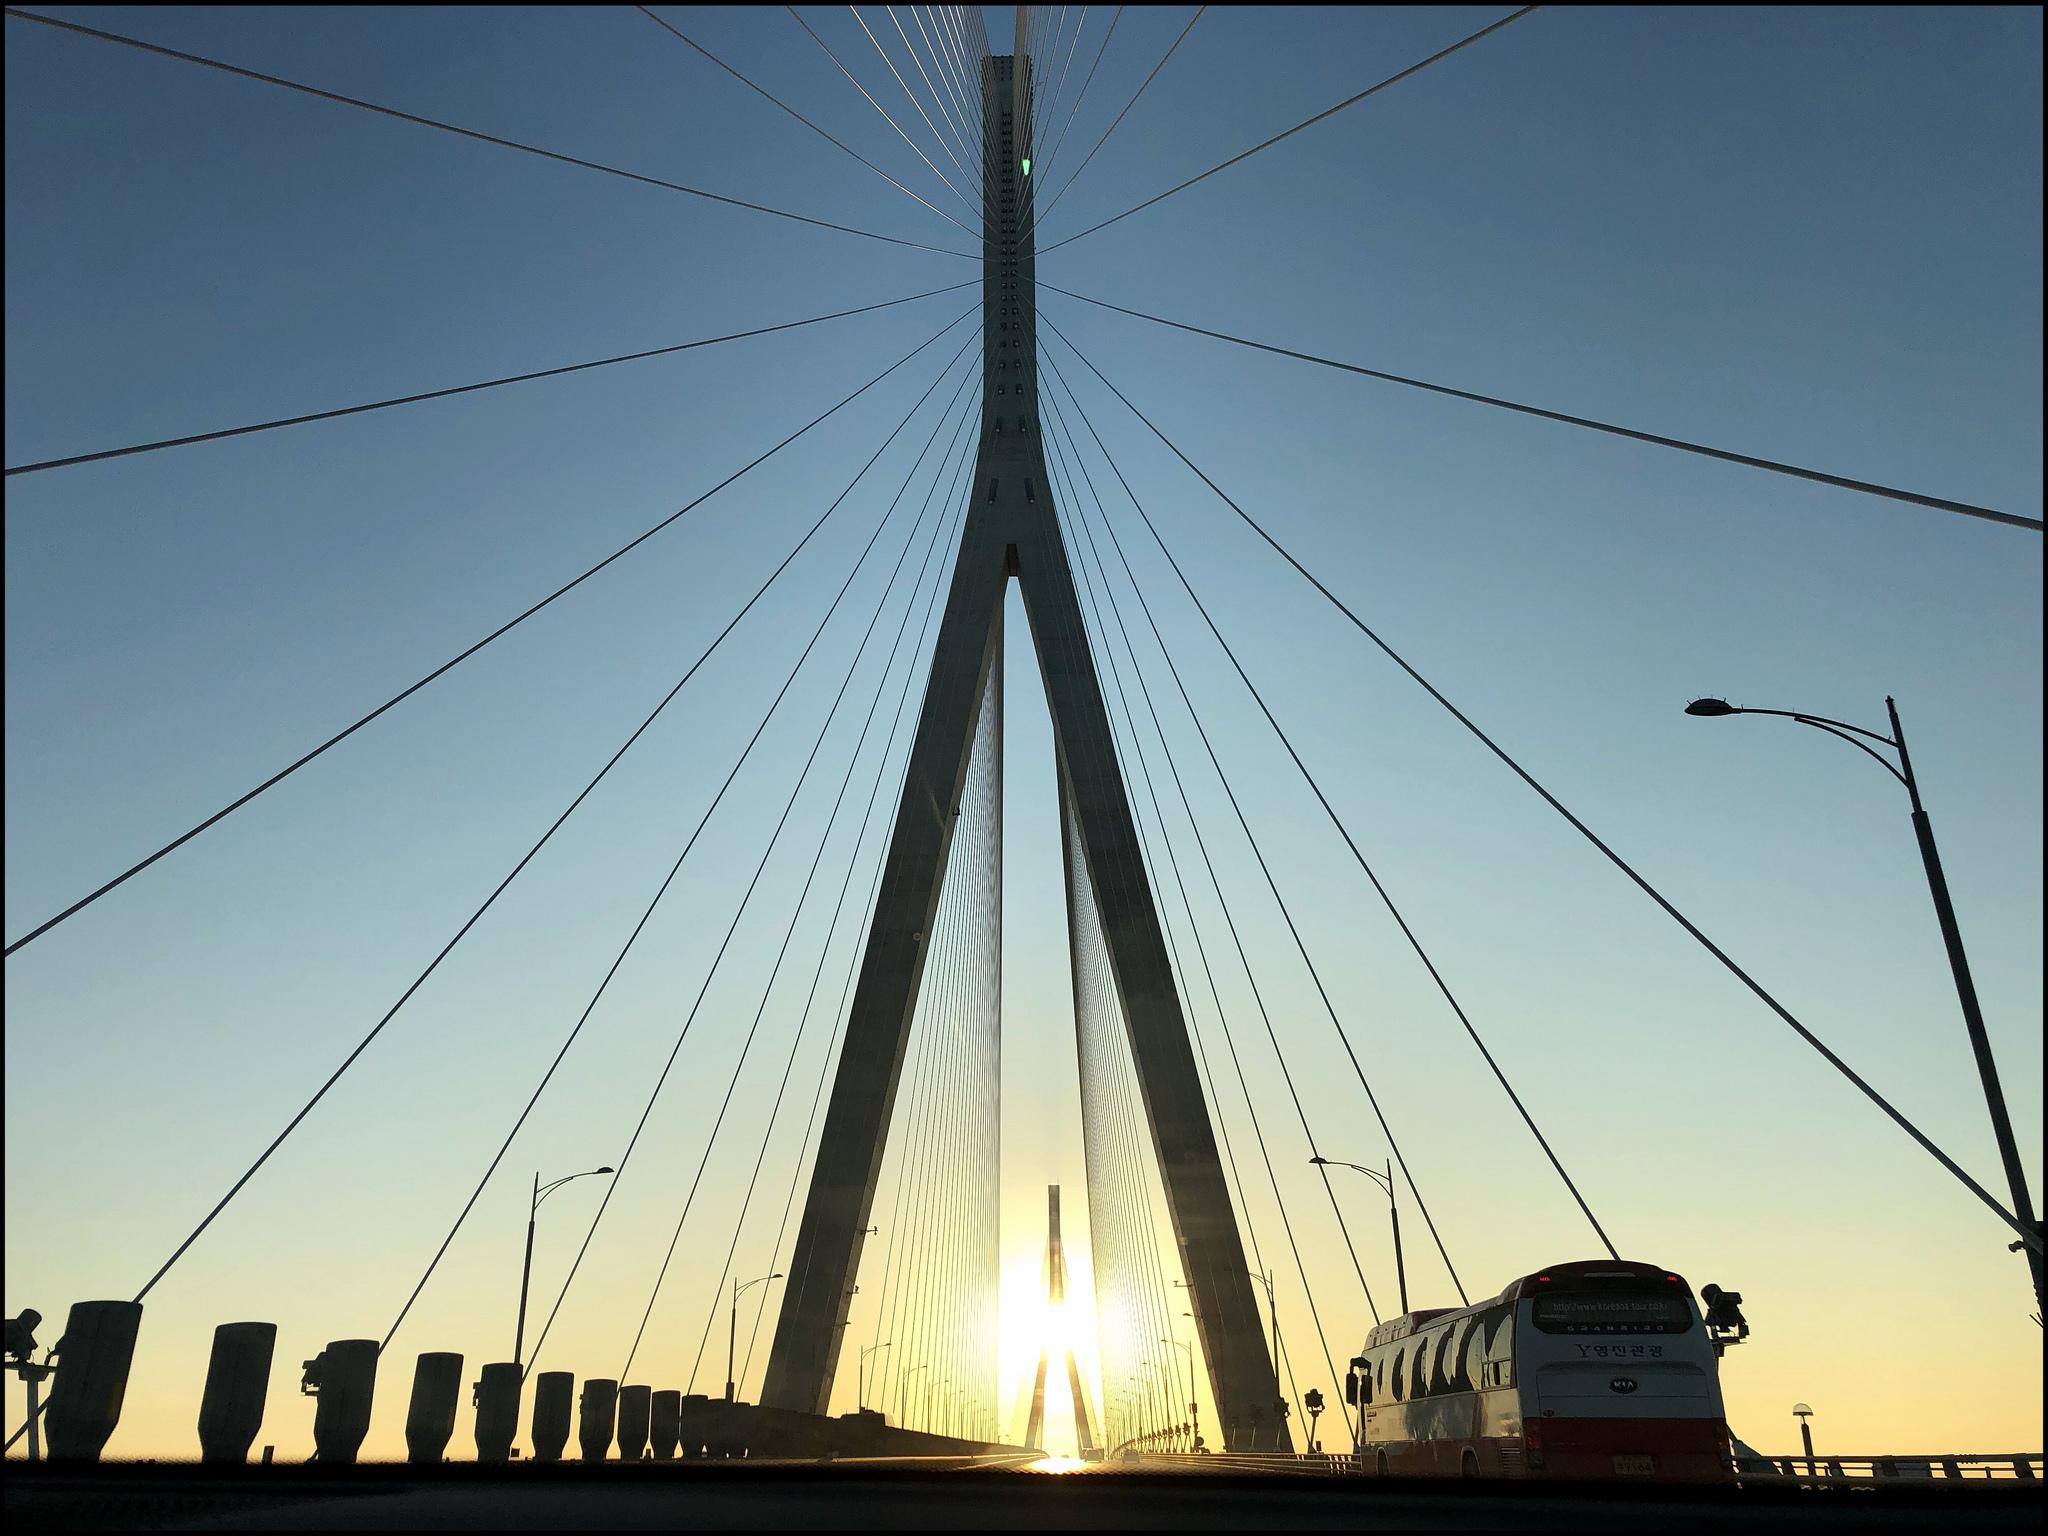 The Incheon Bridge heading into Seoul as the sun was rising